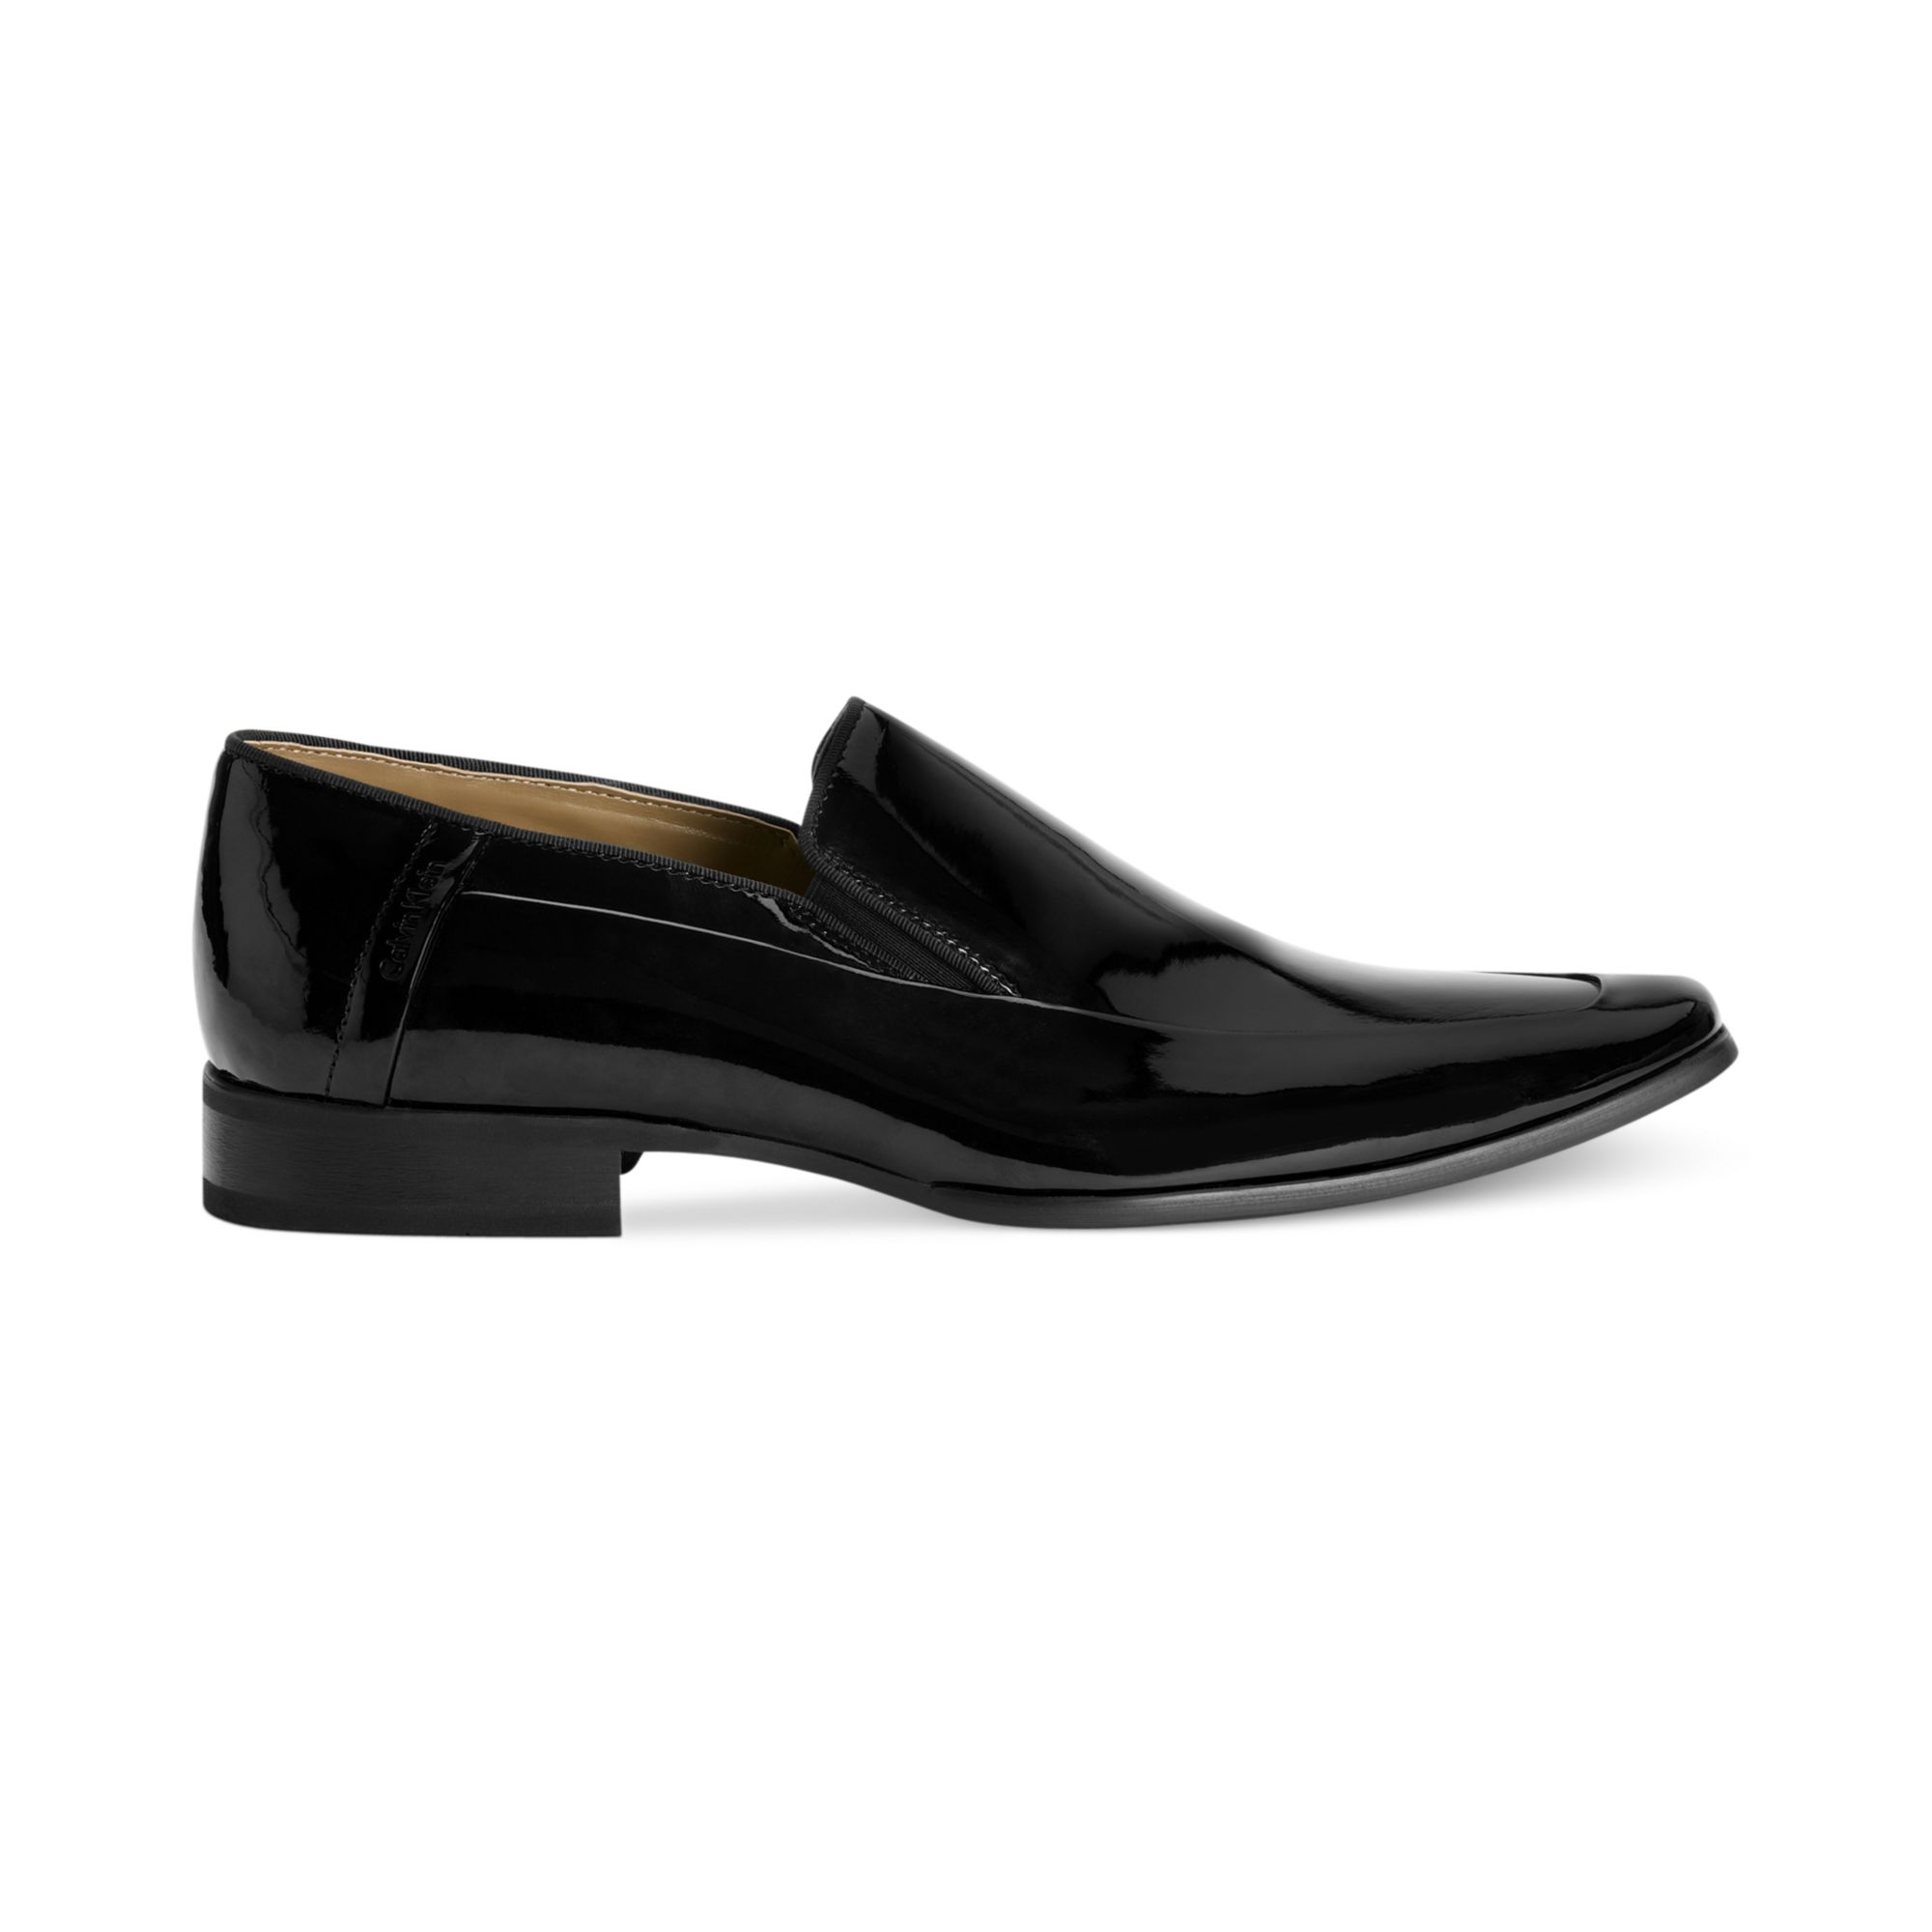 calvin klein s brad patent moc toe slip on shoes in